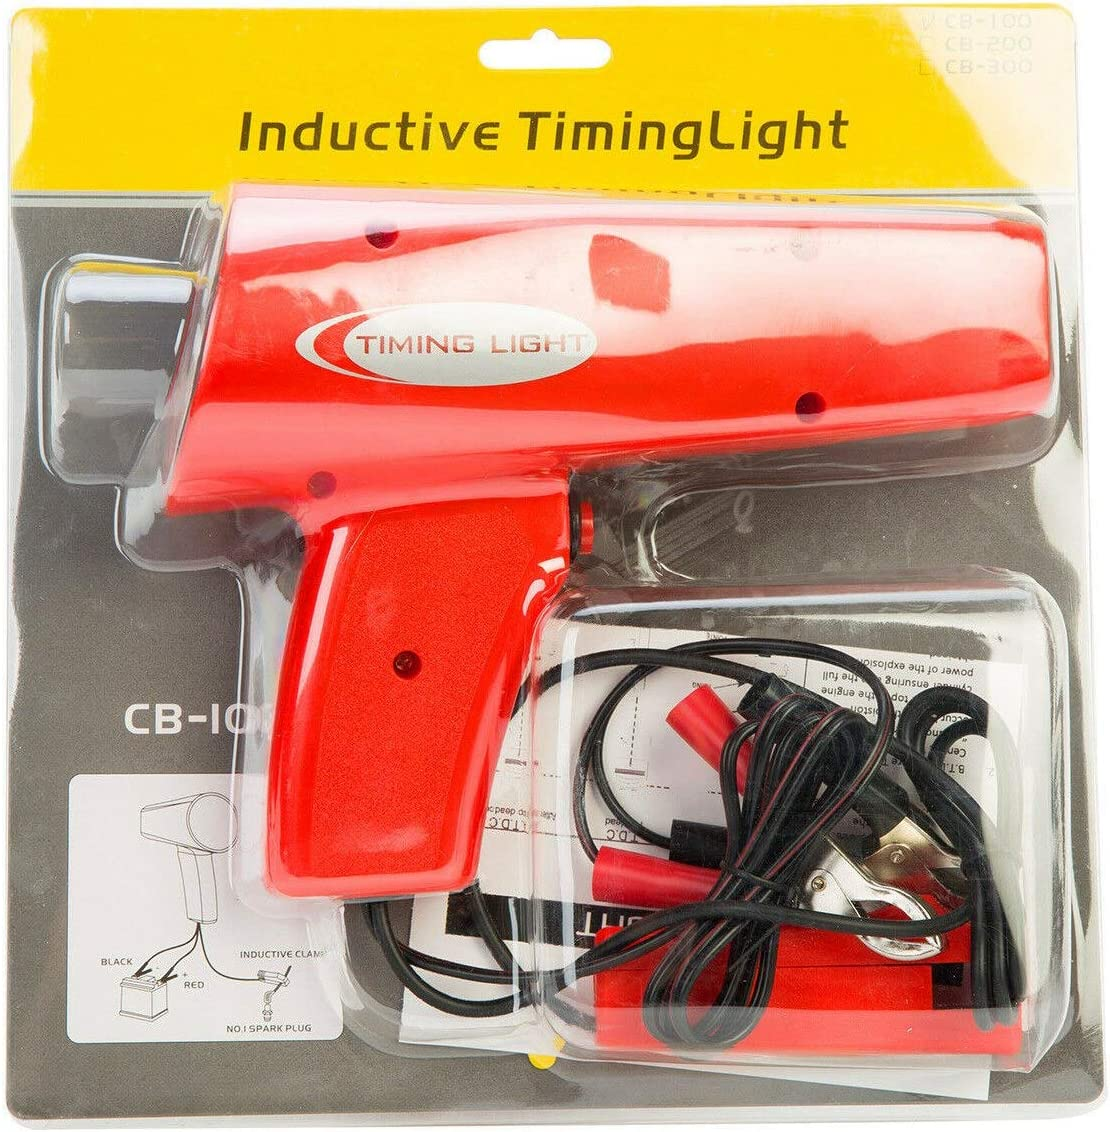 Monland Motor Z/ündung Induktives Timing Licht Fahrzeug Lampe Strobe Tester Z/ündung Strobe Timing Lampe//Licht Freier Stecker Tester